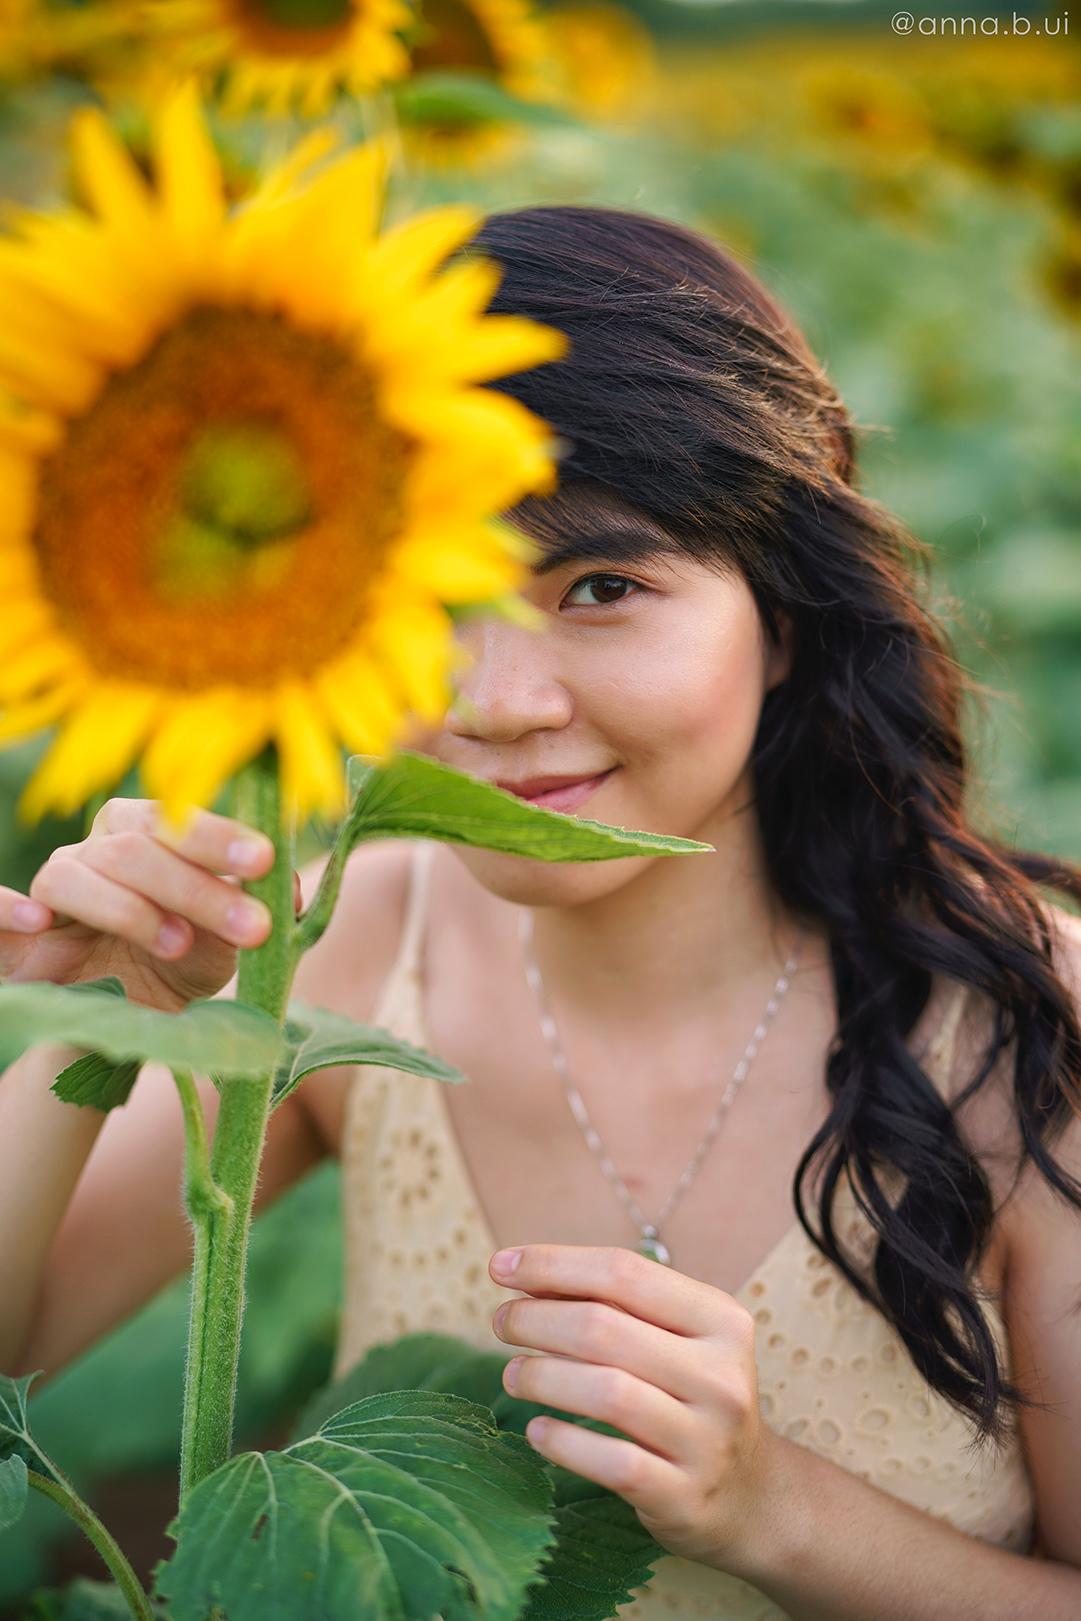 BeInspireful - Sunny Sunflower Field Yellow Dress 1 - export